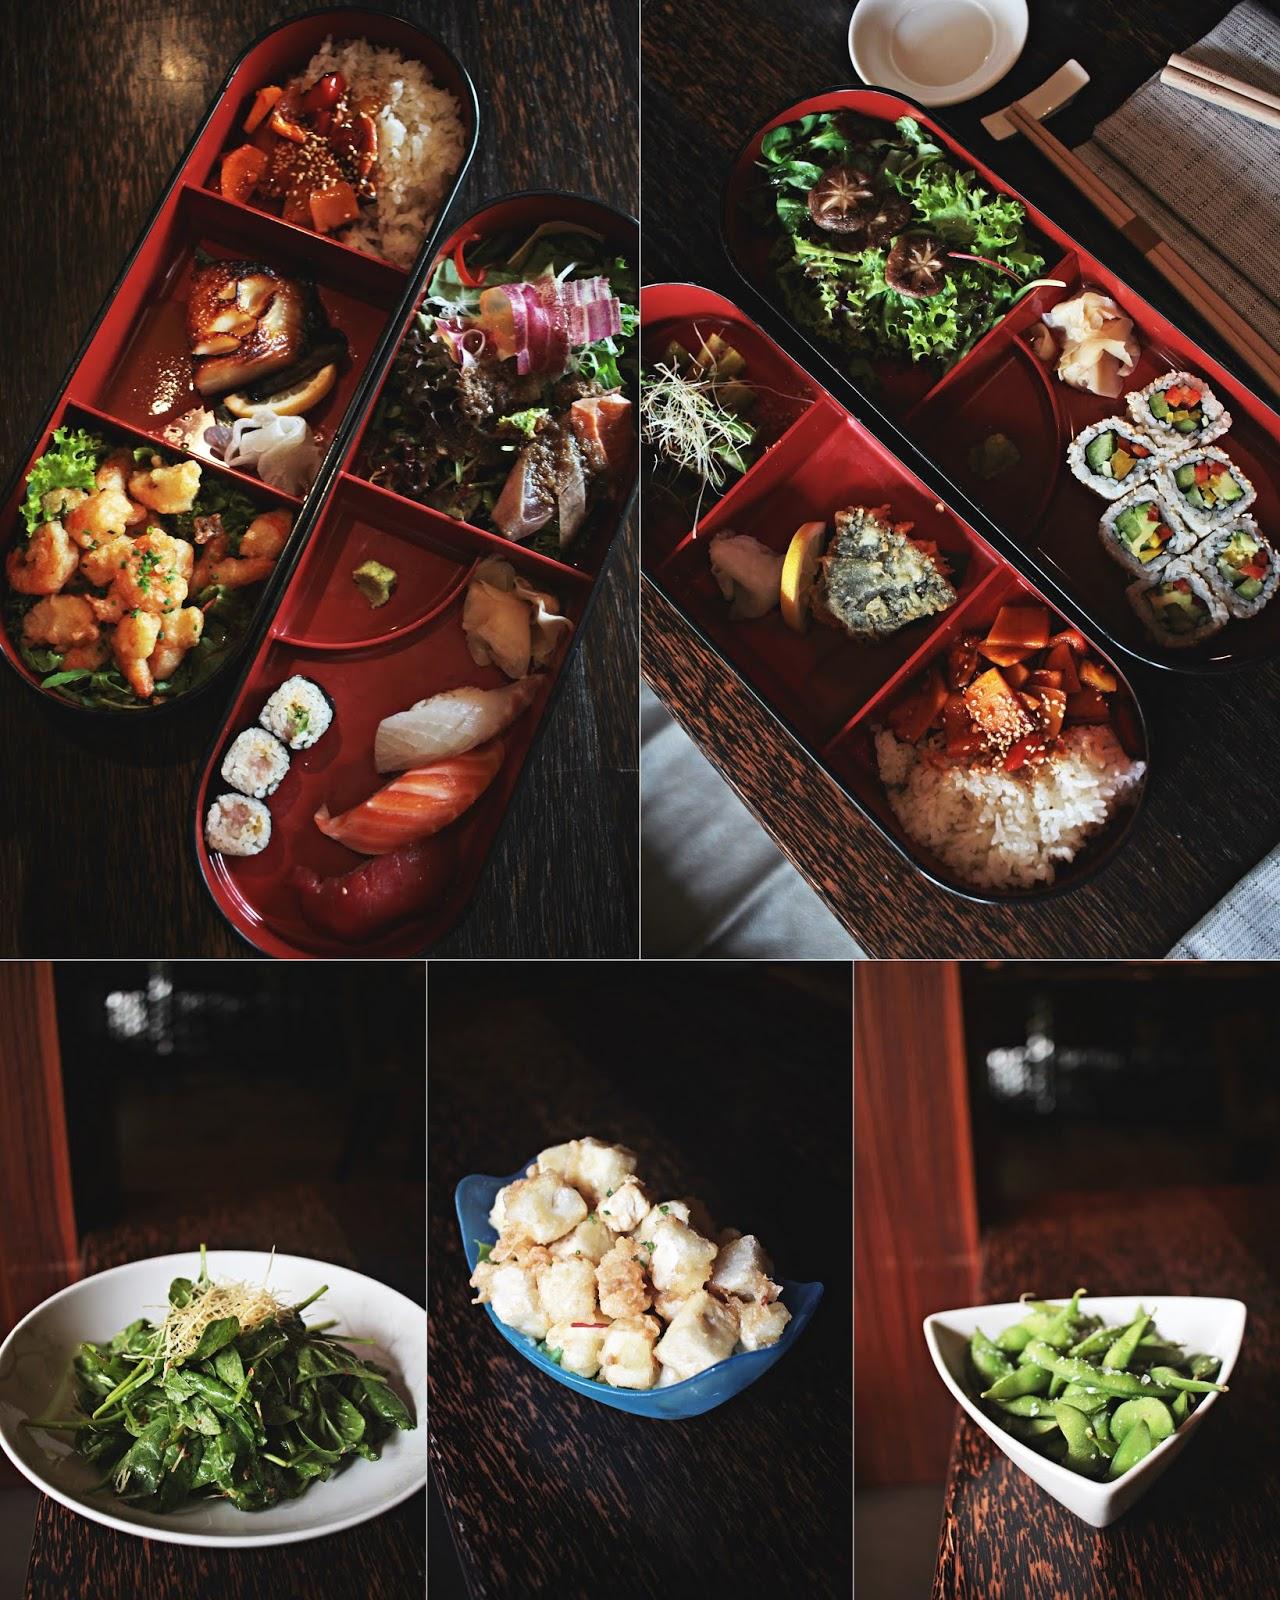 bentobox lunch mandarin oriental matsuhisa